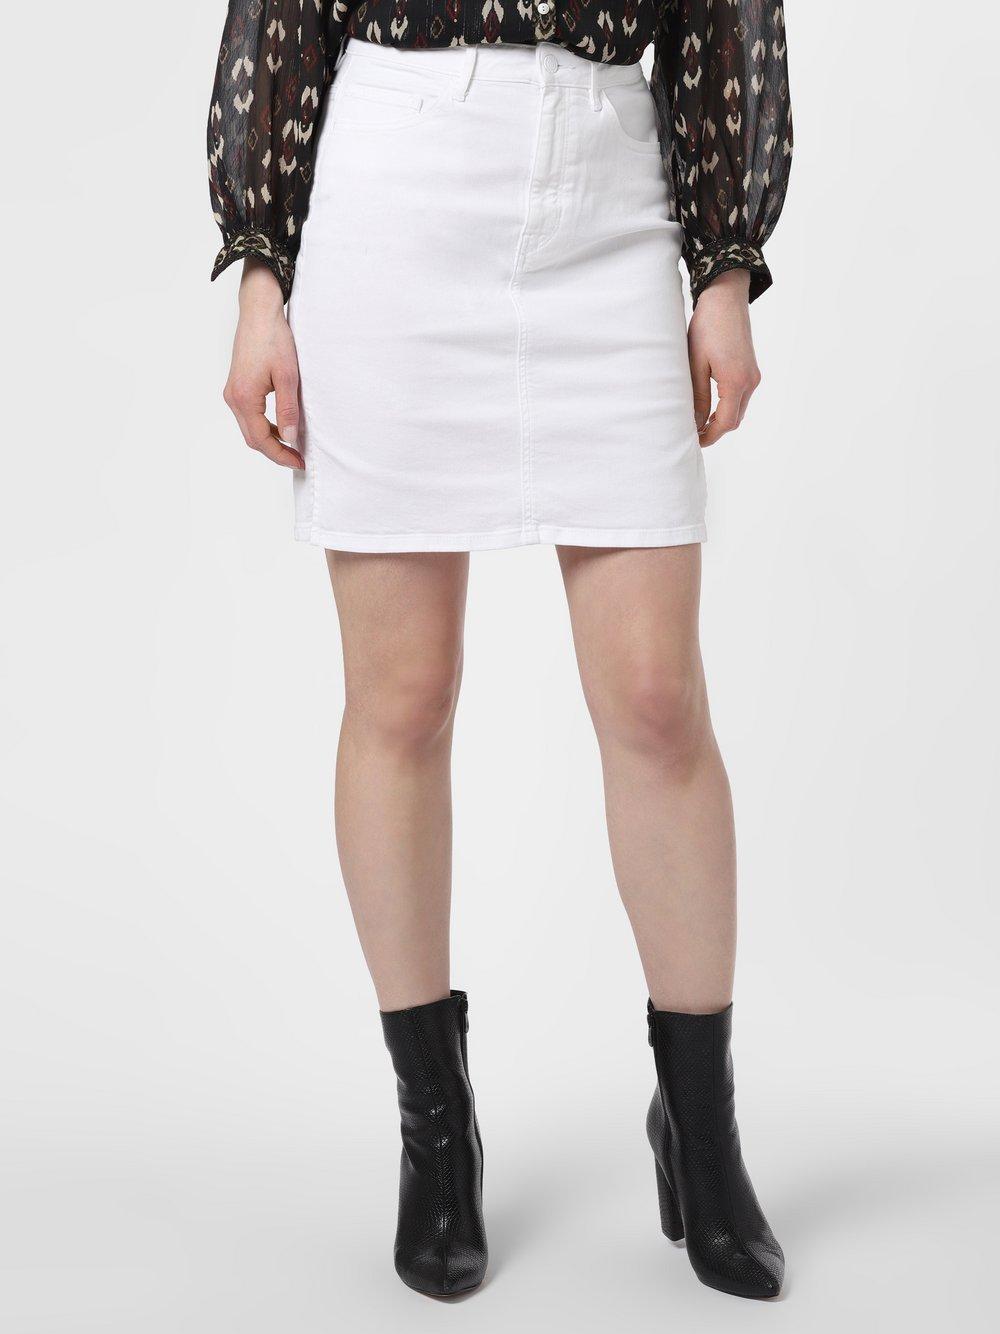 BOSS Casual - Jeansowa spódnica damska – J90 Elgin, biały